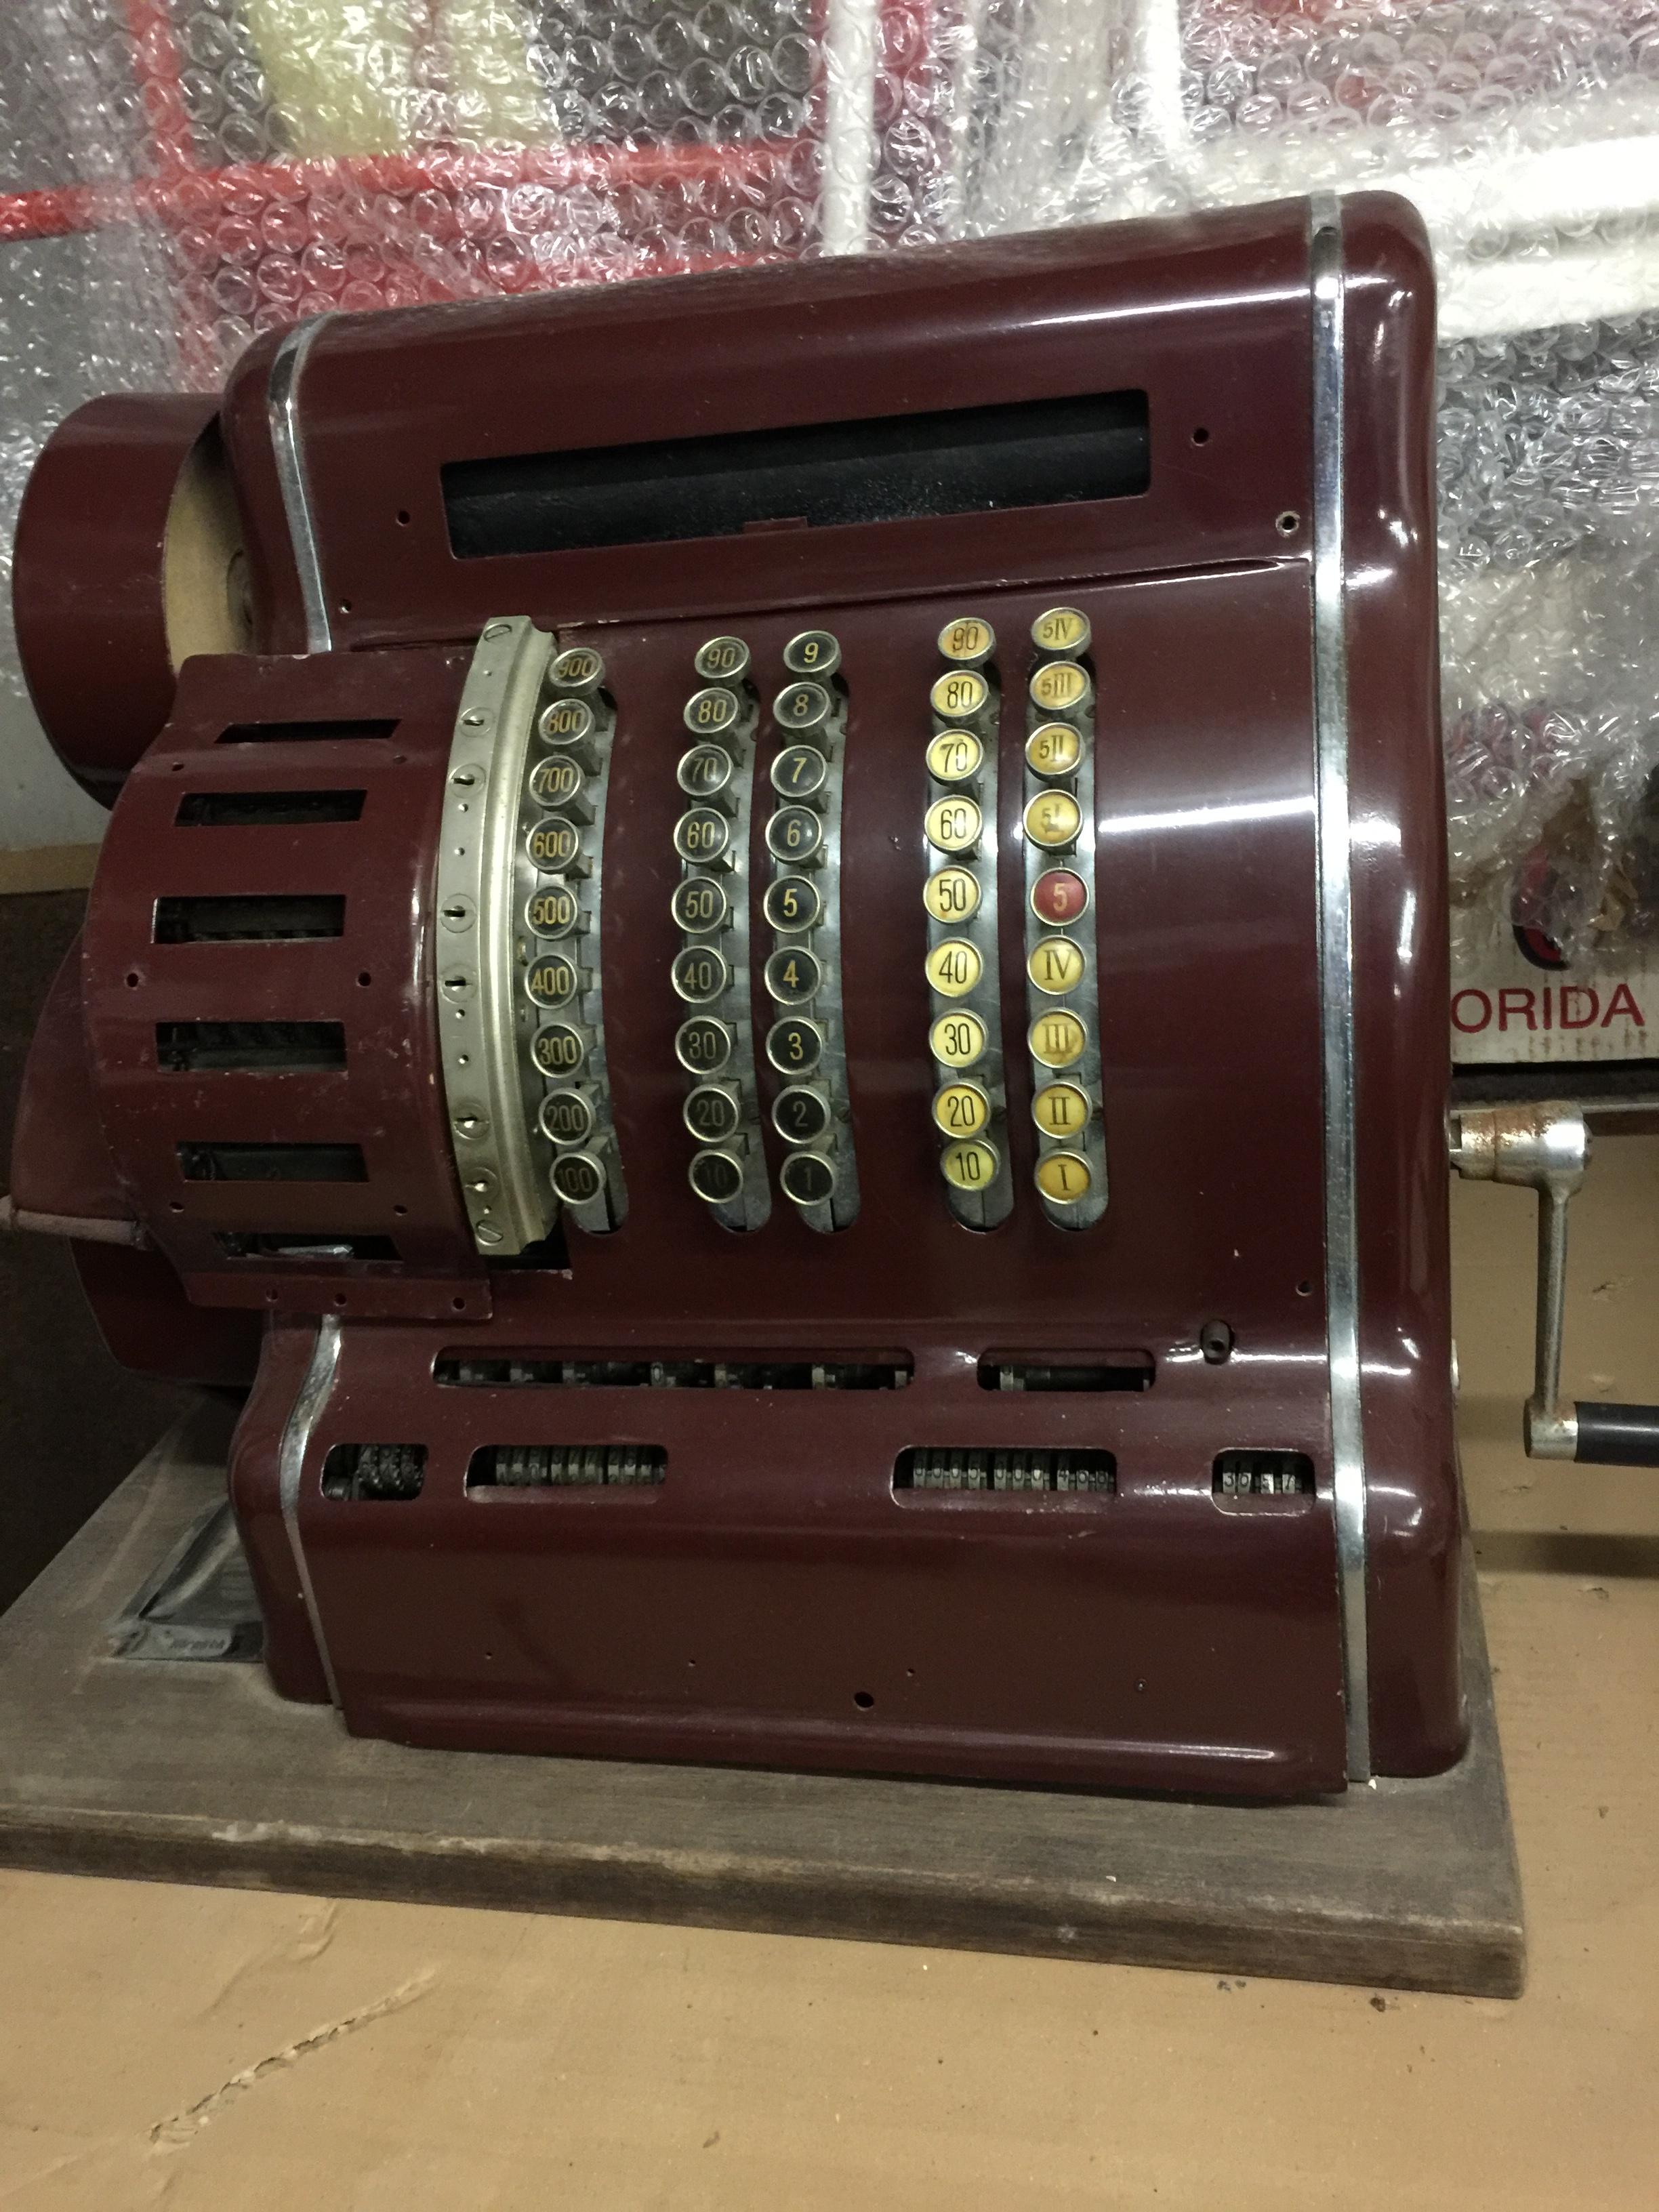 ancienne caisse enregistreuese 1910? international f 0 Avranches (50)